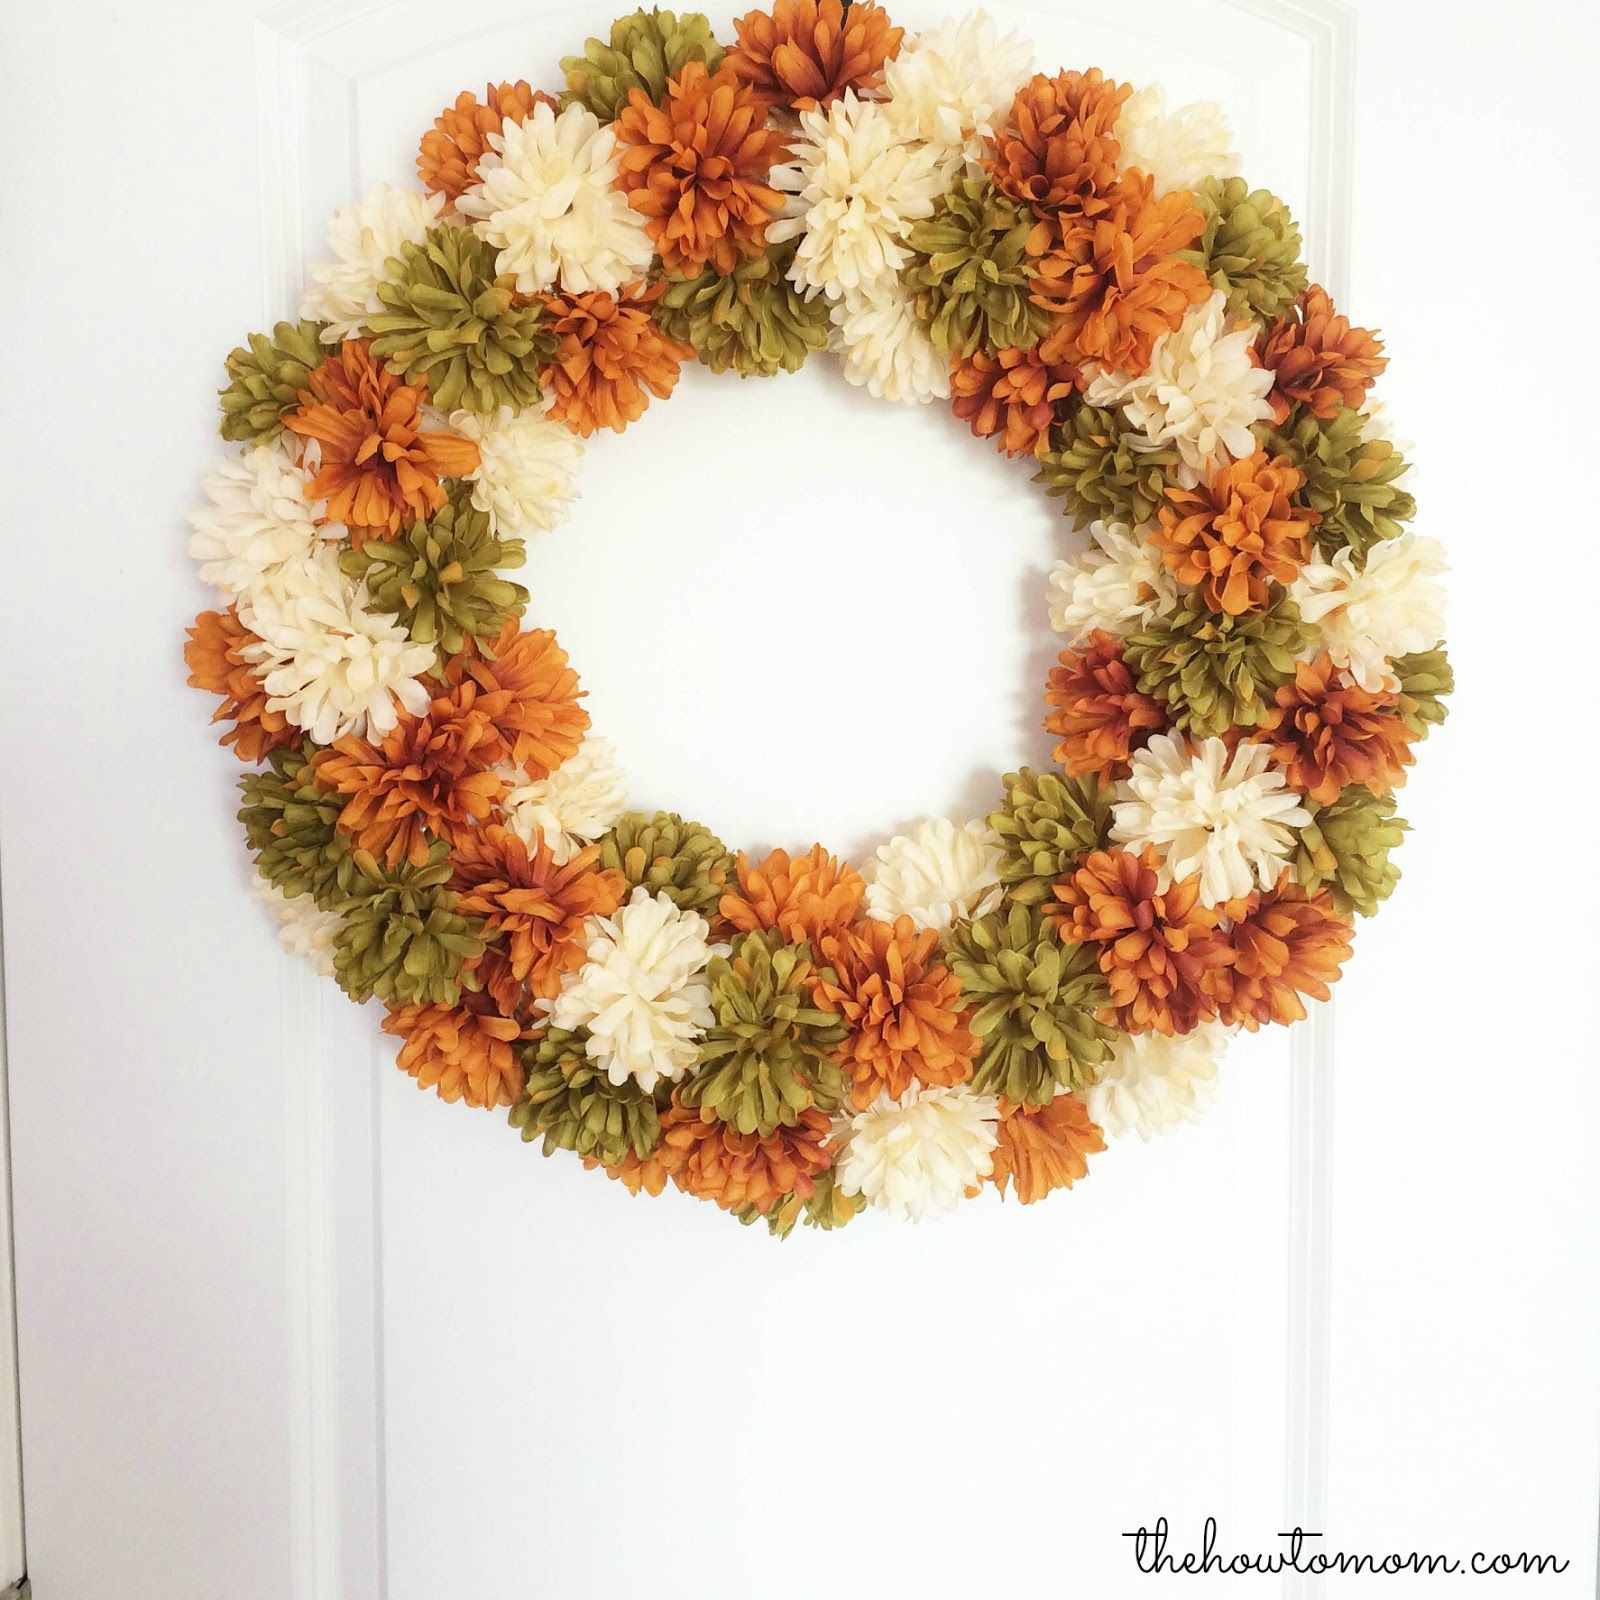 Easy Fall Mum Wreath DIY - no hot glue!